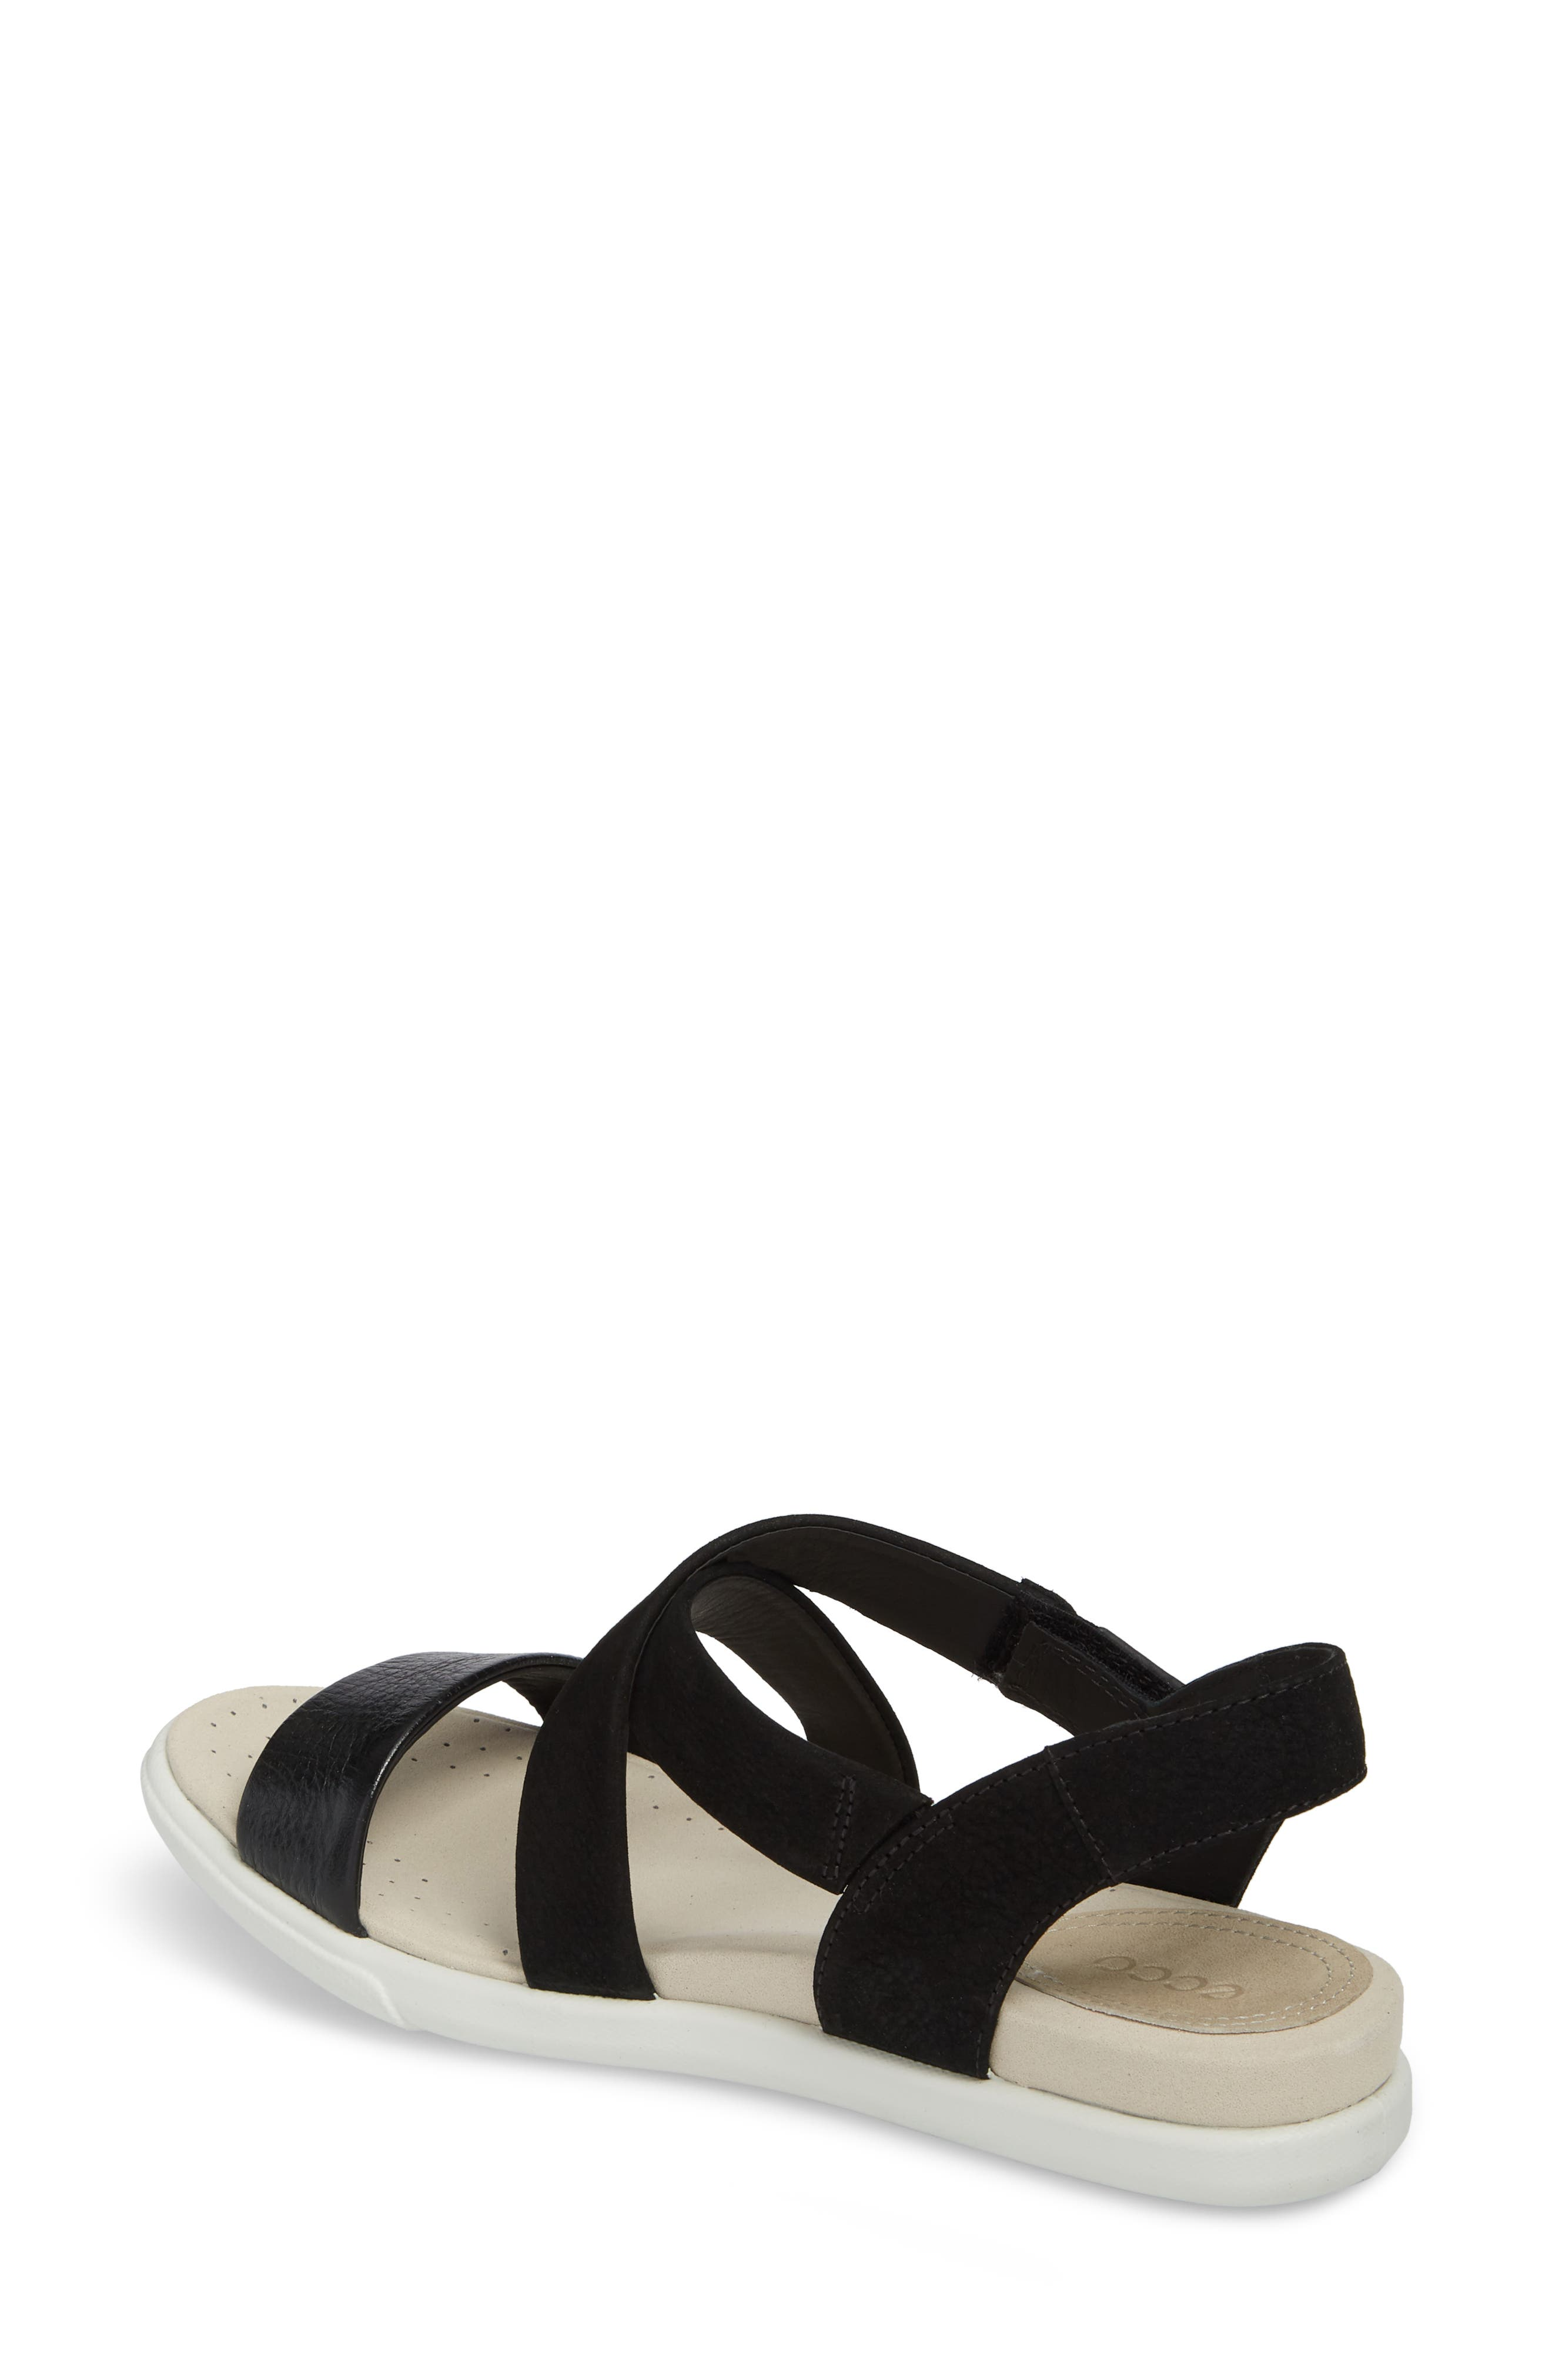 Damara Cross-Strap Sandal,                             Alternate thumbnail 2, color,                             Black Leather